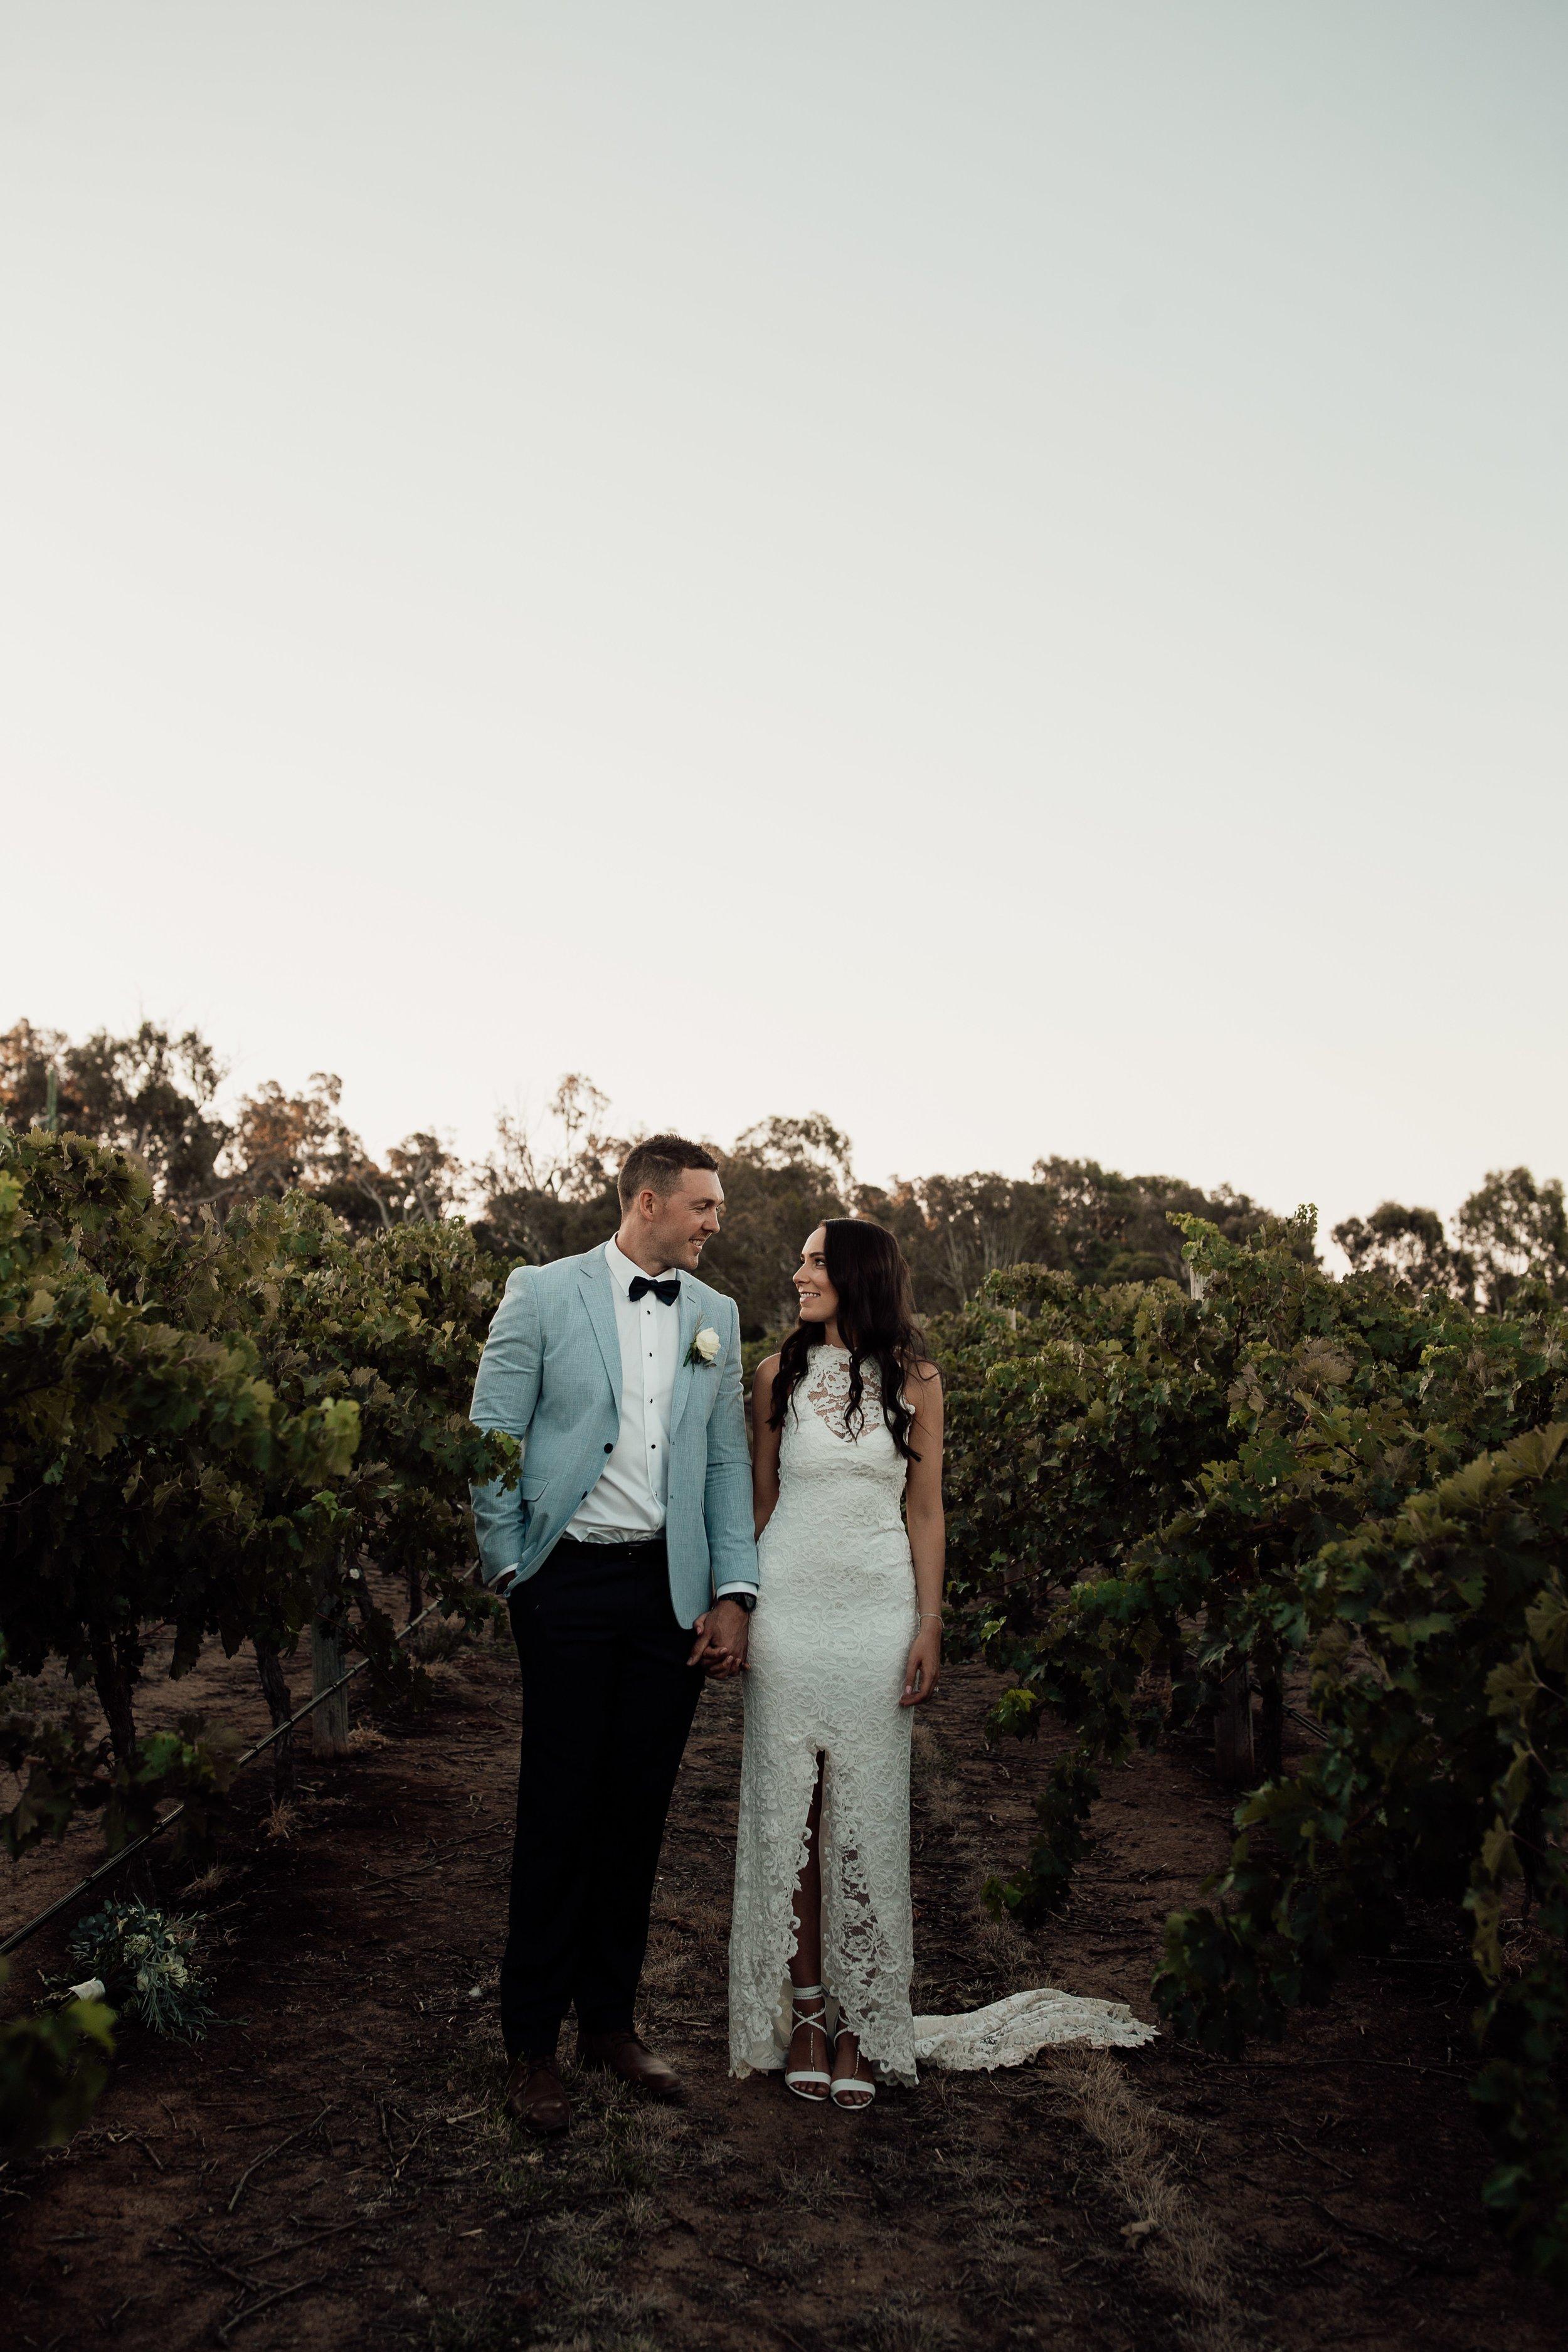 mickalathomas_puremacphotography_weddingphotographer_couplephotographer_Sheppartonphotographer_2920.jpg